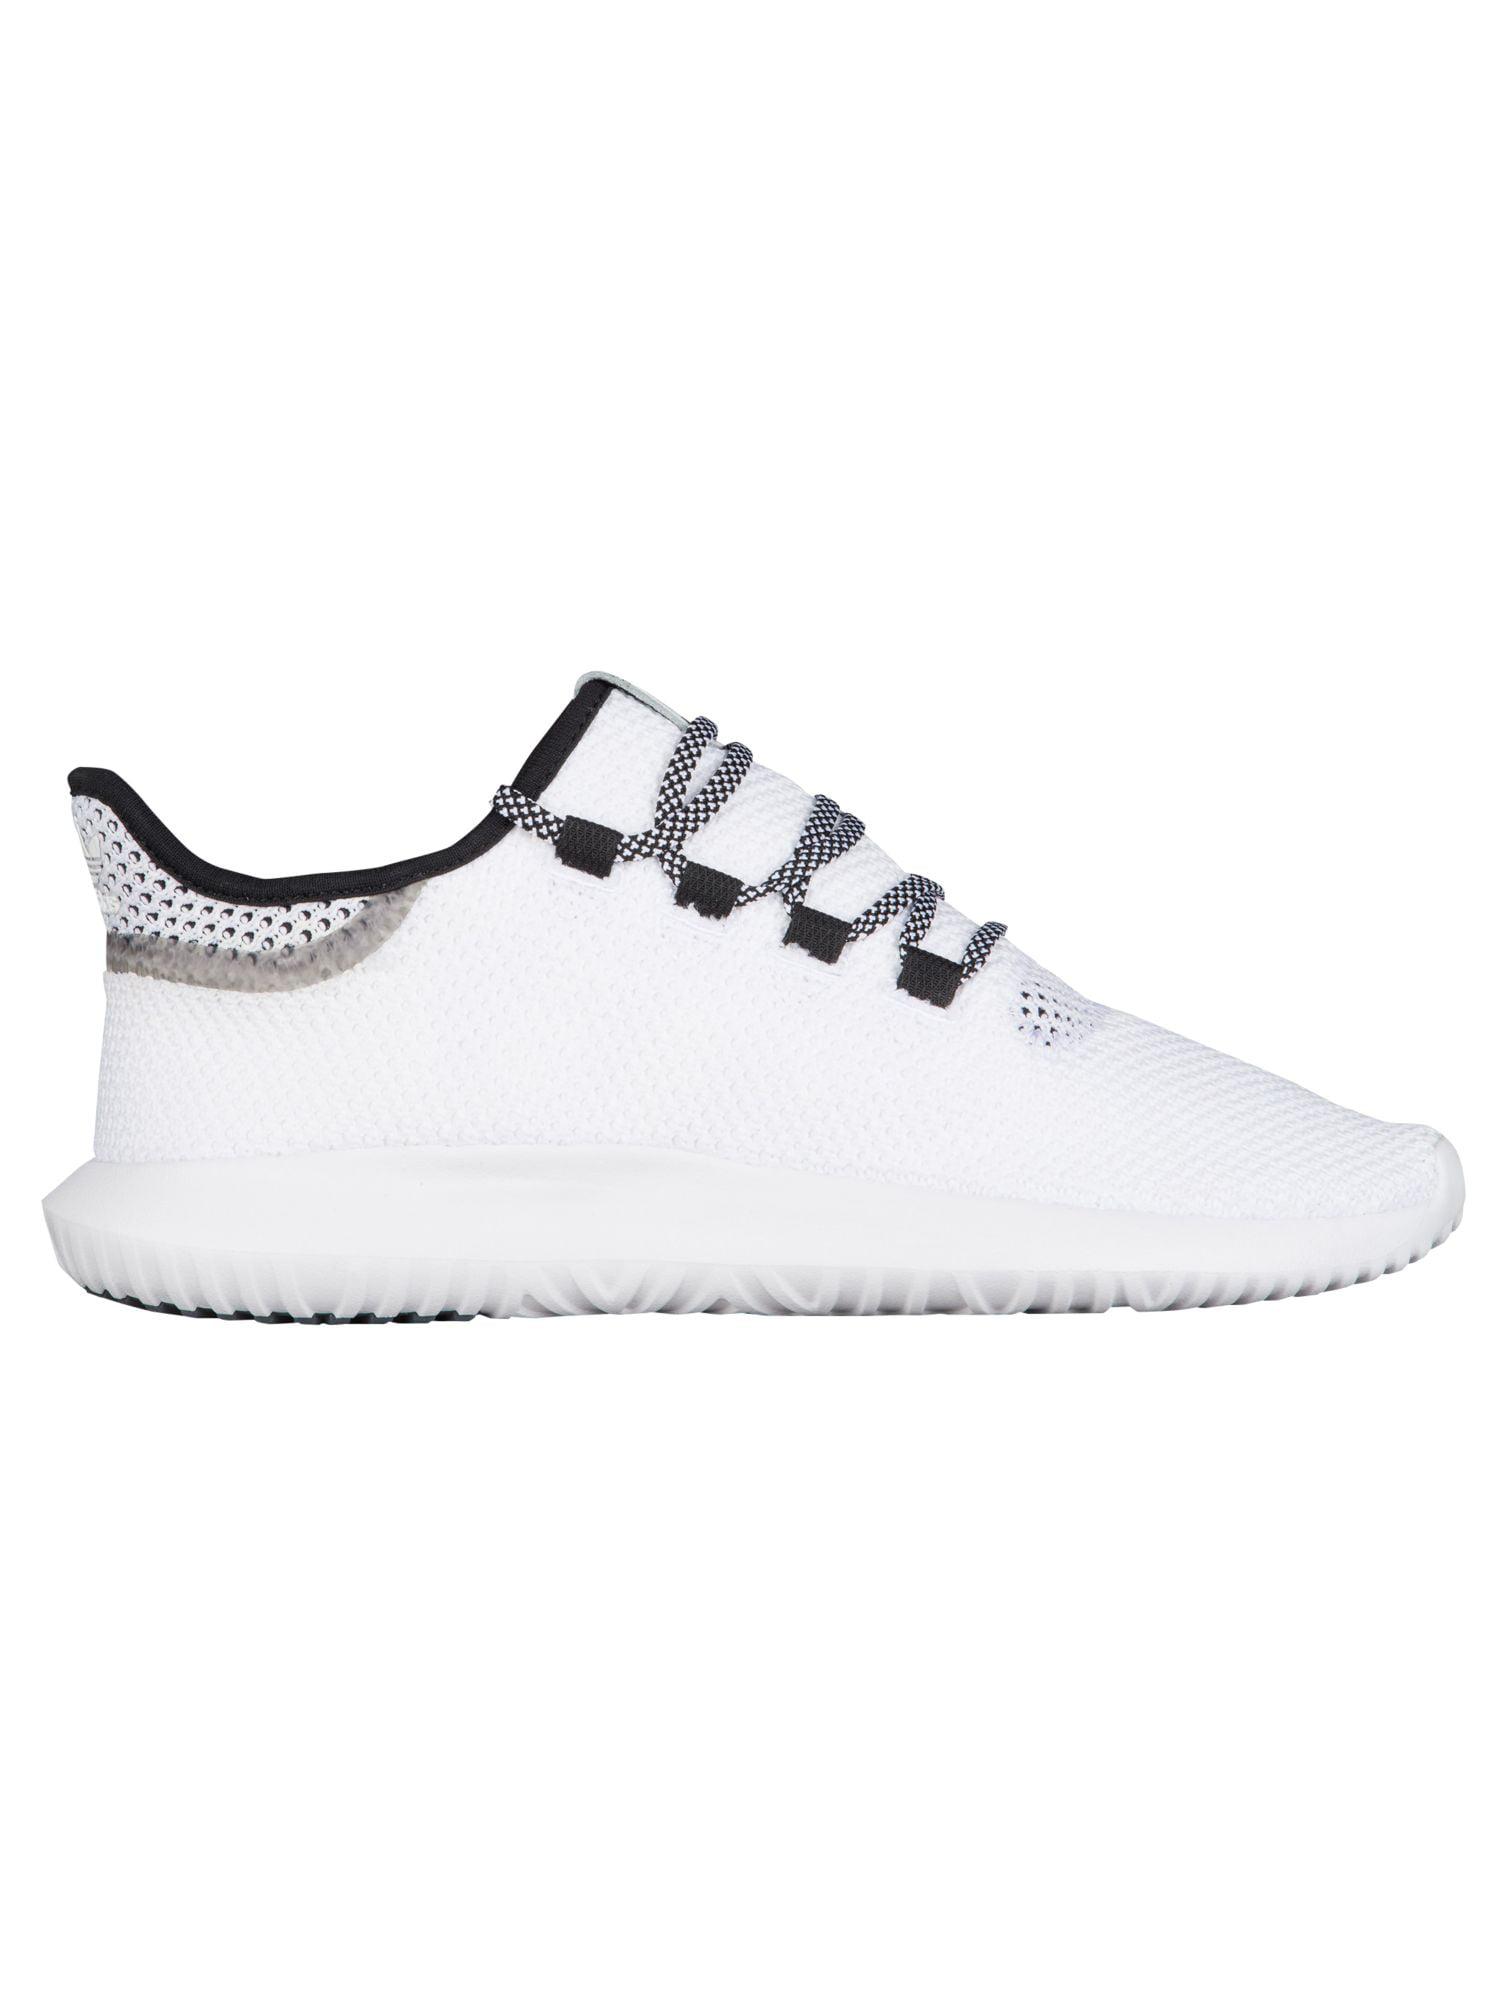 reputable site 1545a ee7fa adidas Originals Tubular Shadow Men's Basketball Shoes White/White/Black